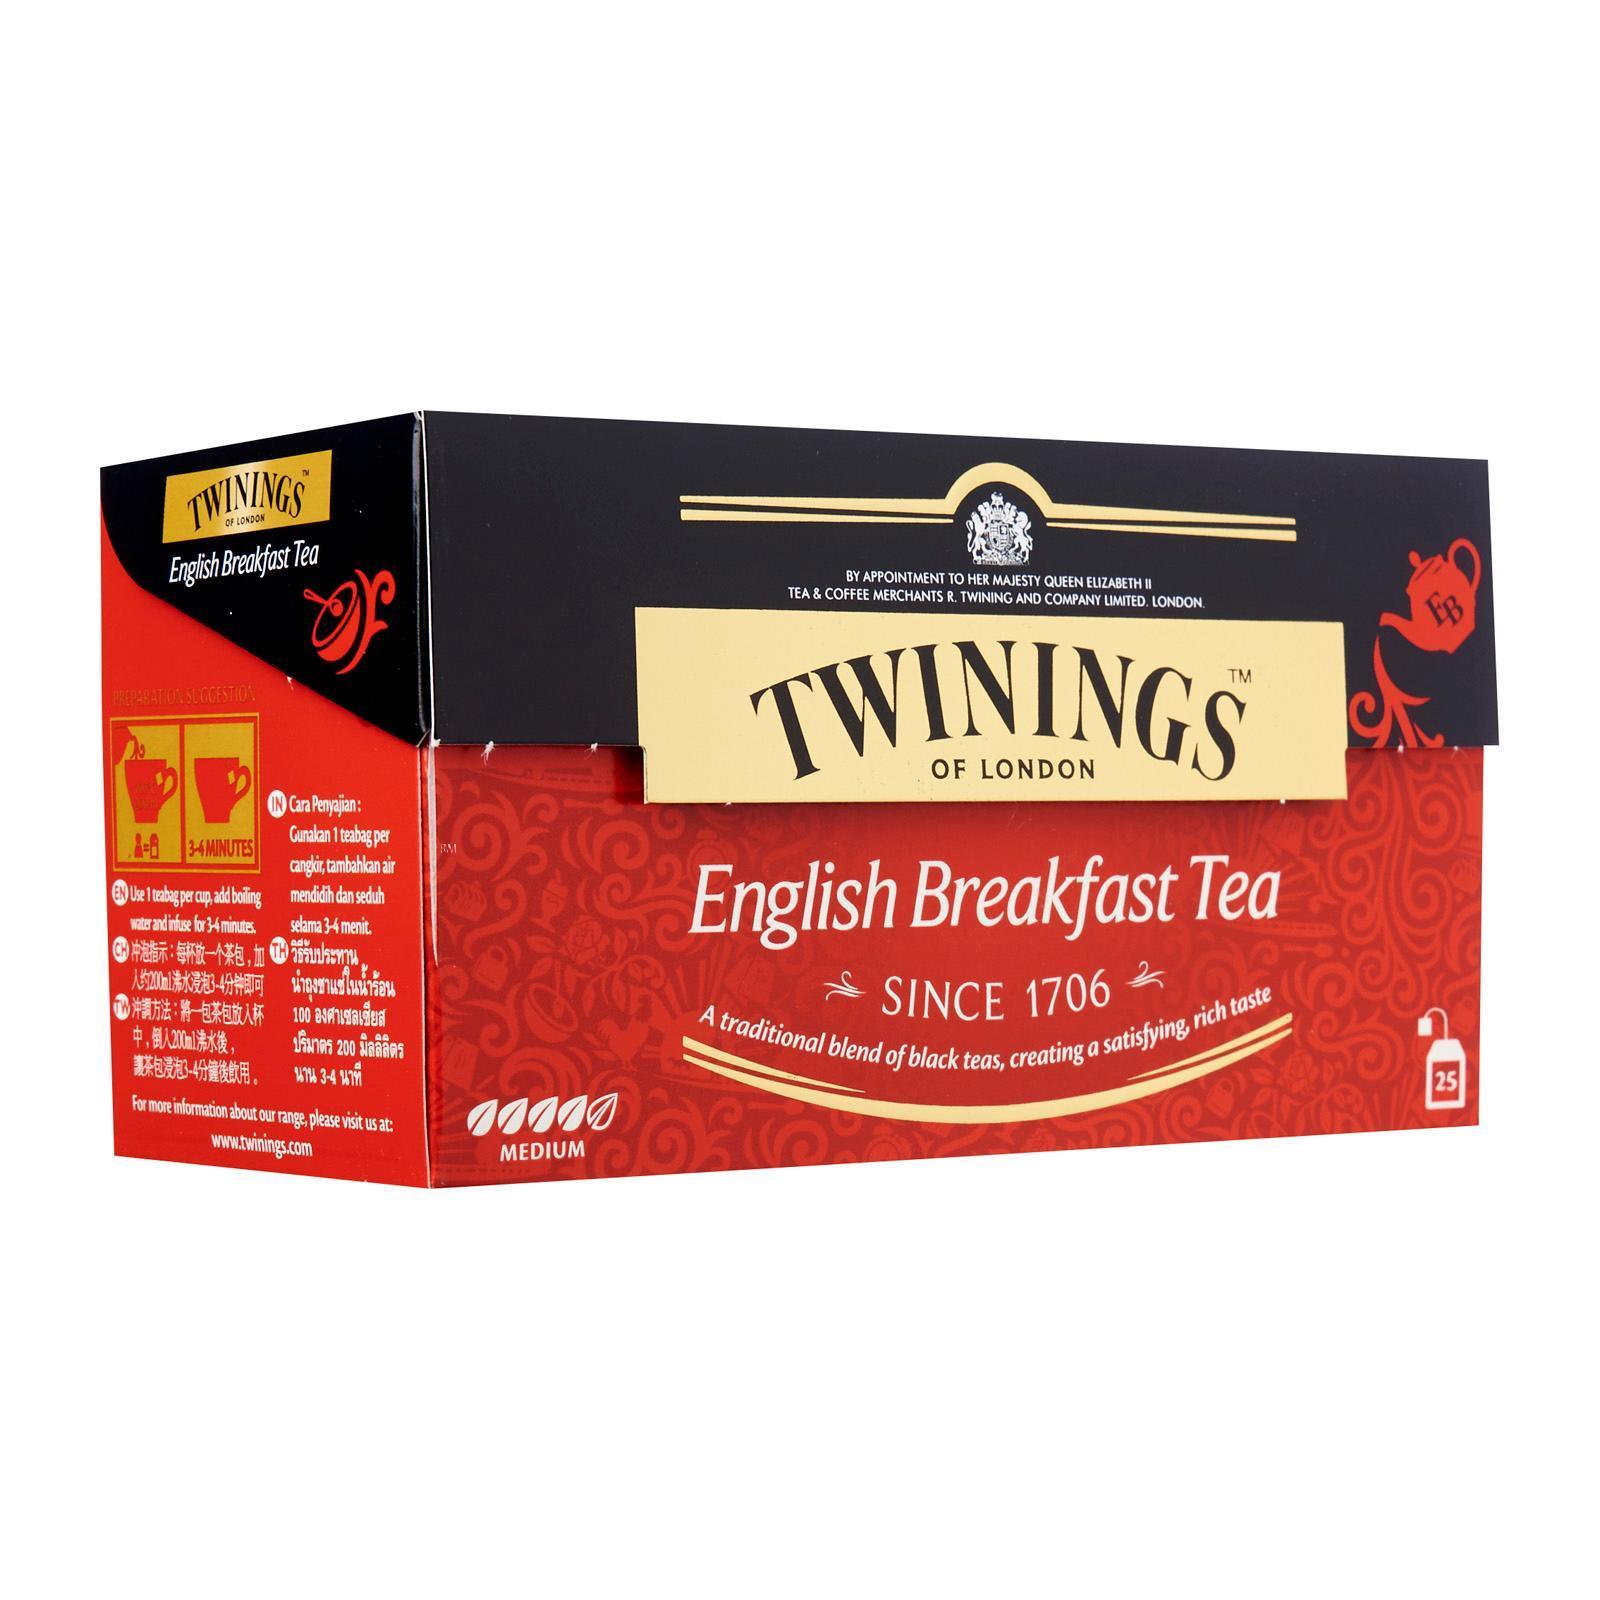 TWININGS English Breakfast Tea 25sX2g